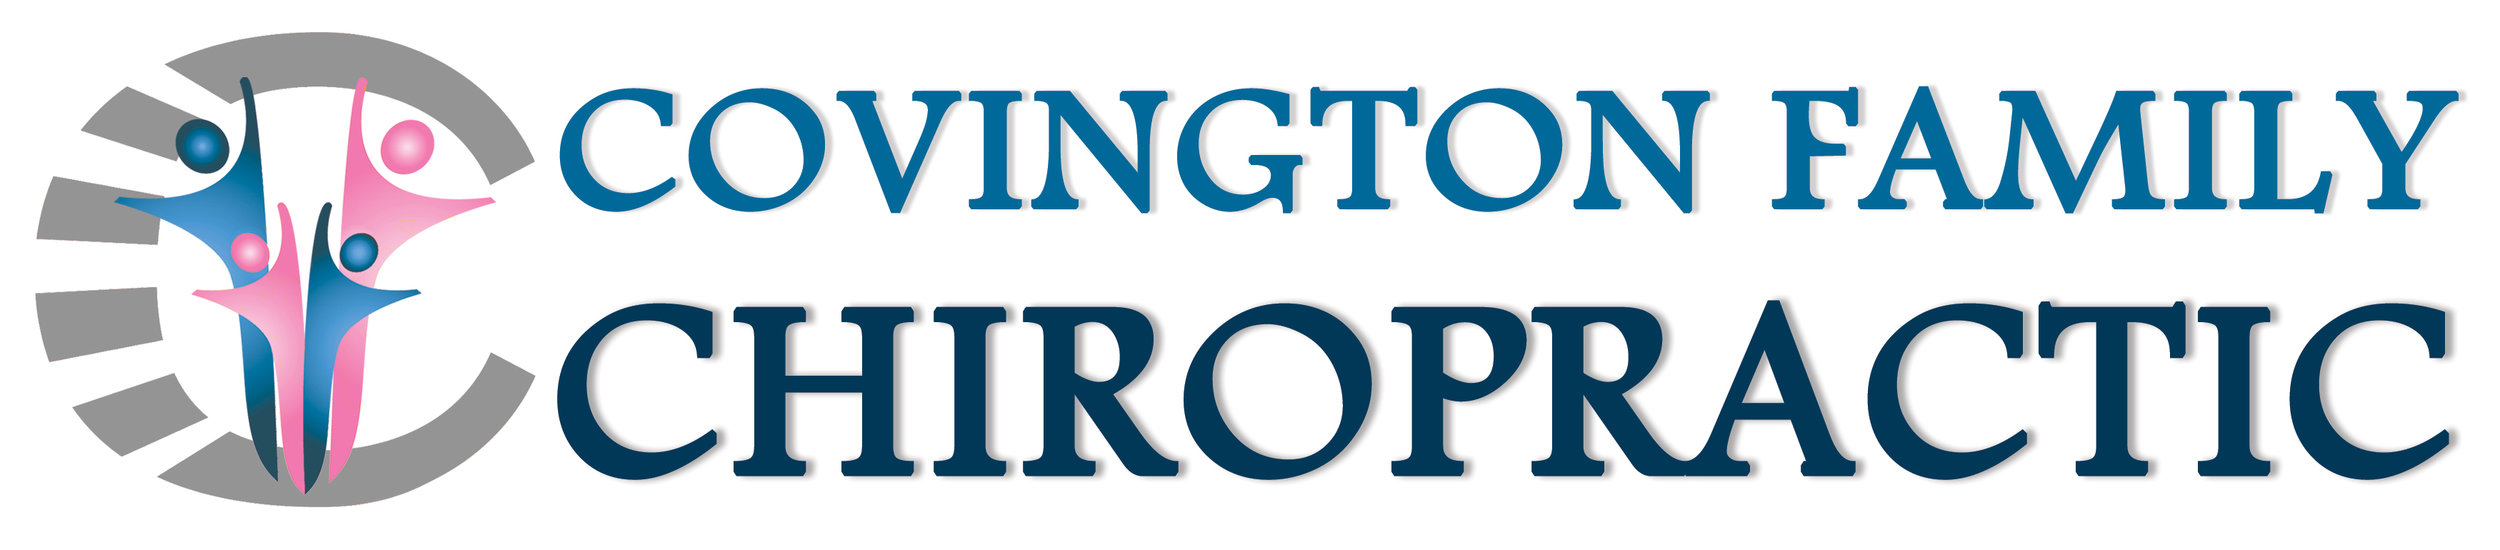 Covington Family Chiropractic -